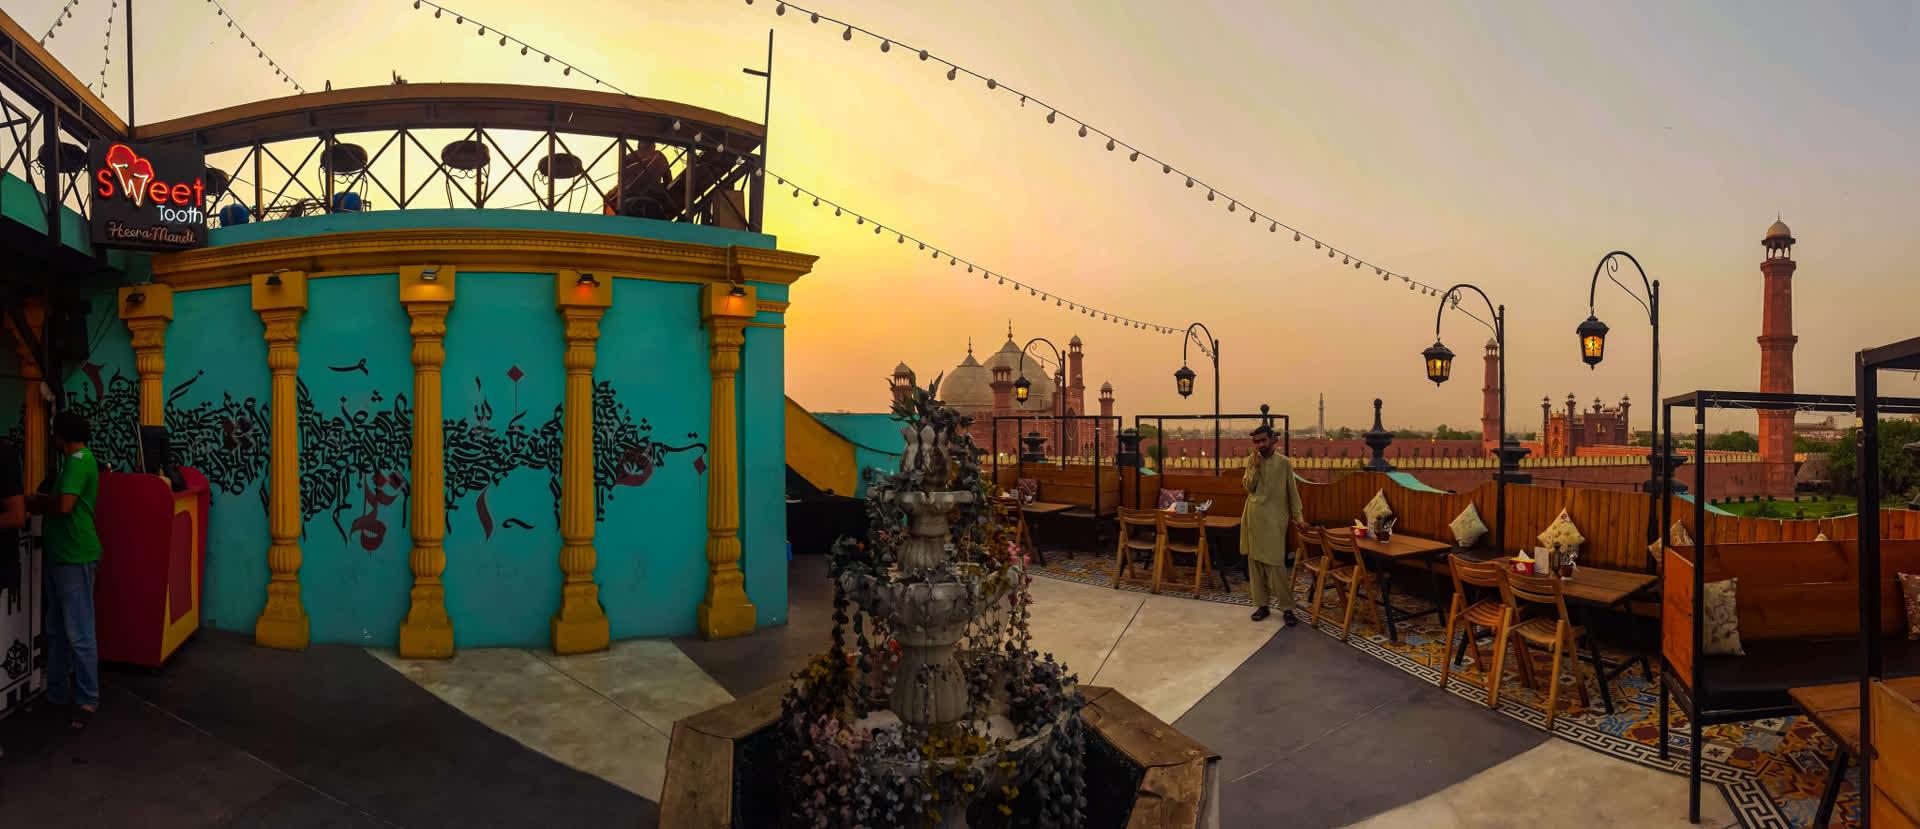 View of Badshahi Mosque from an eatery in Heera Mandi